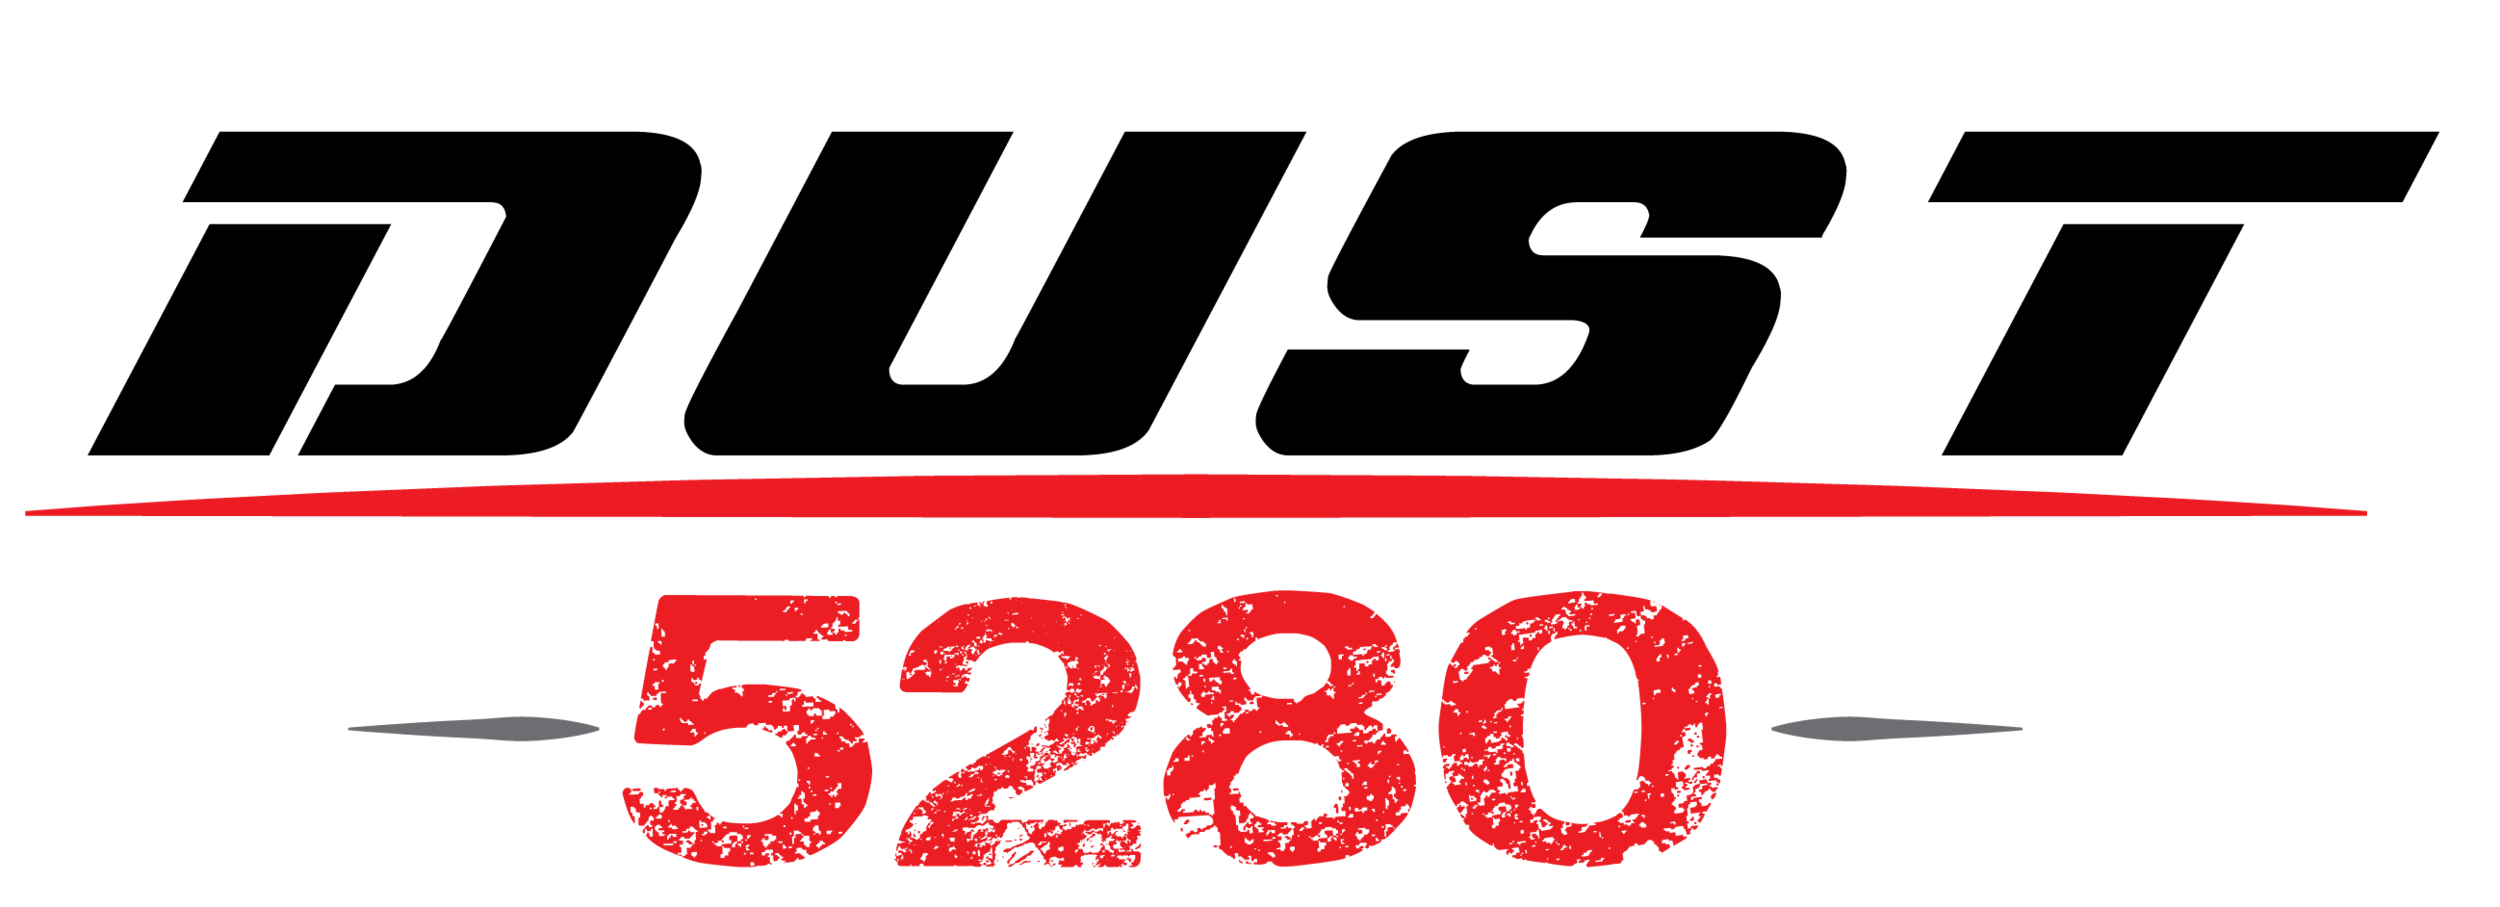 Dust 5280 Final-01.png